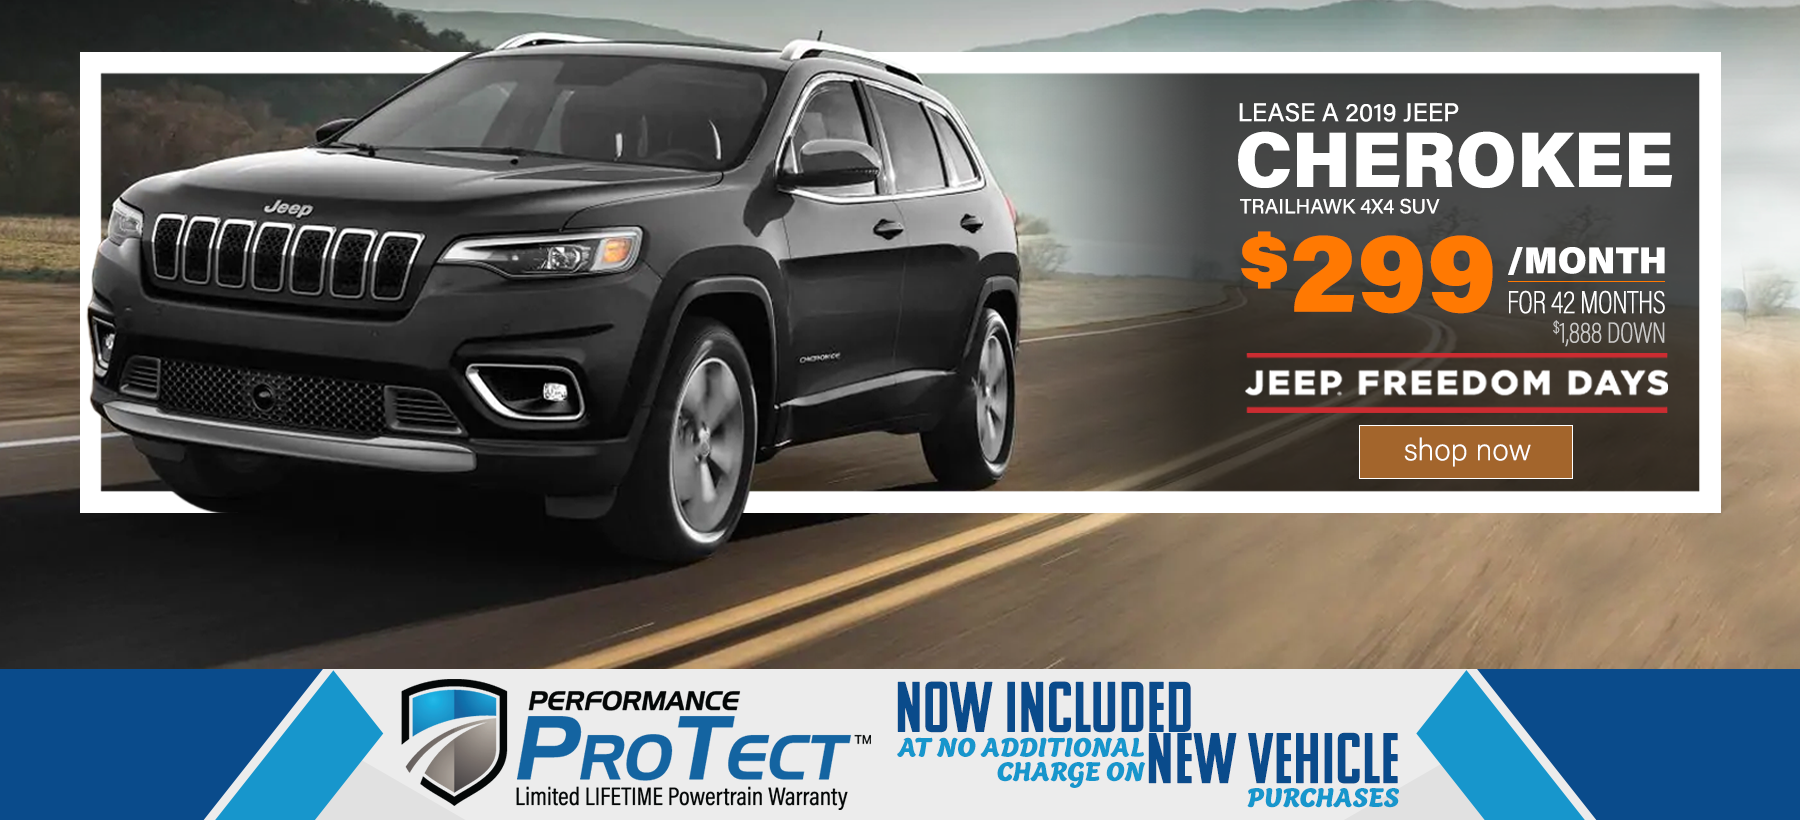 new-2019-jeep-cherokee-lease-dayton-ohio